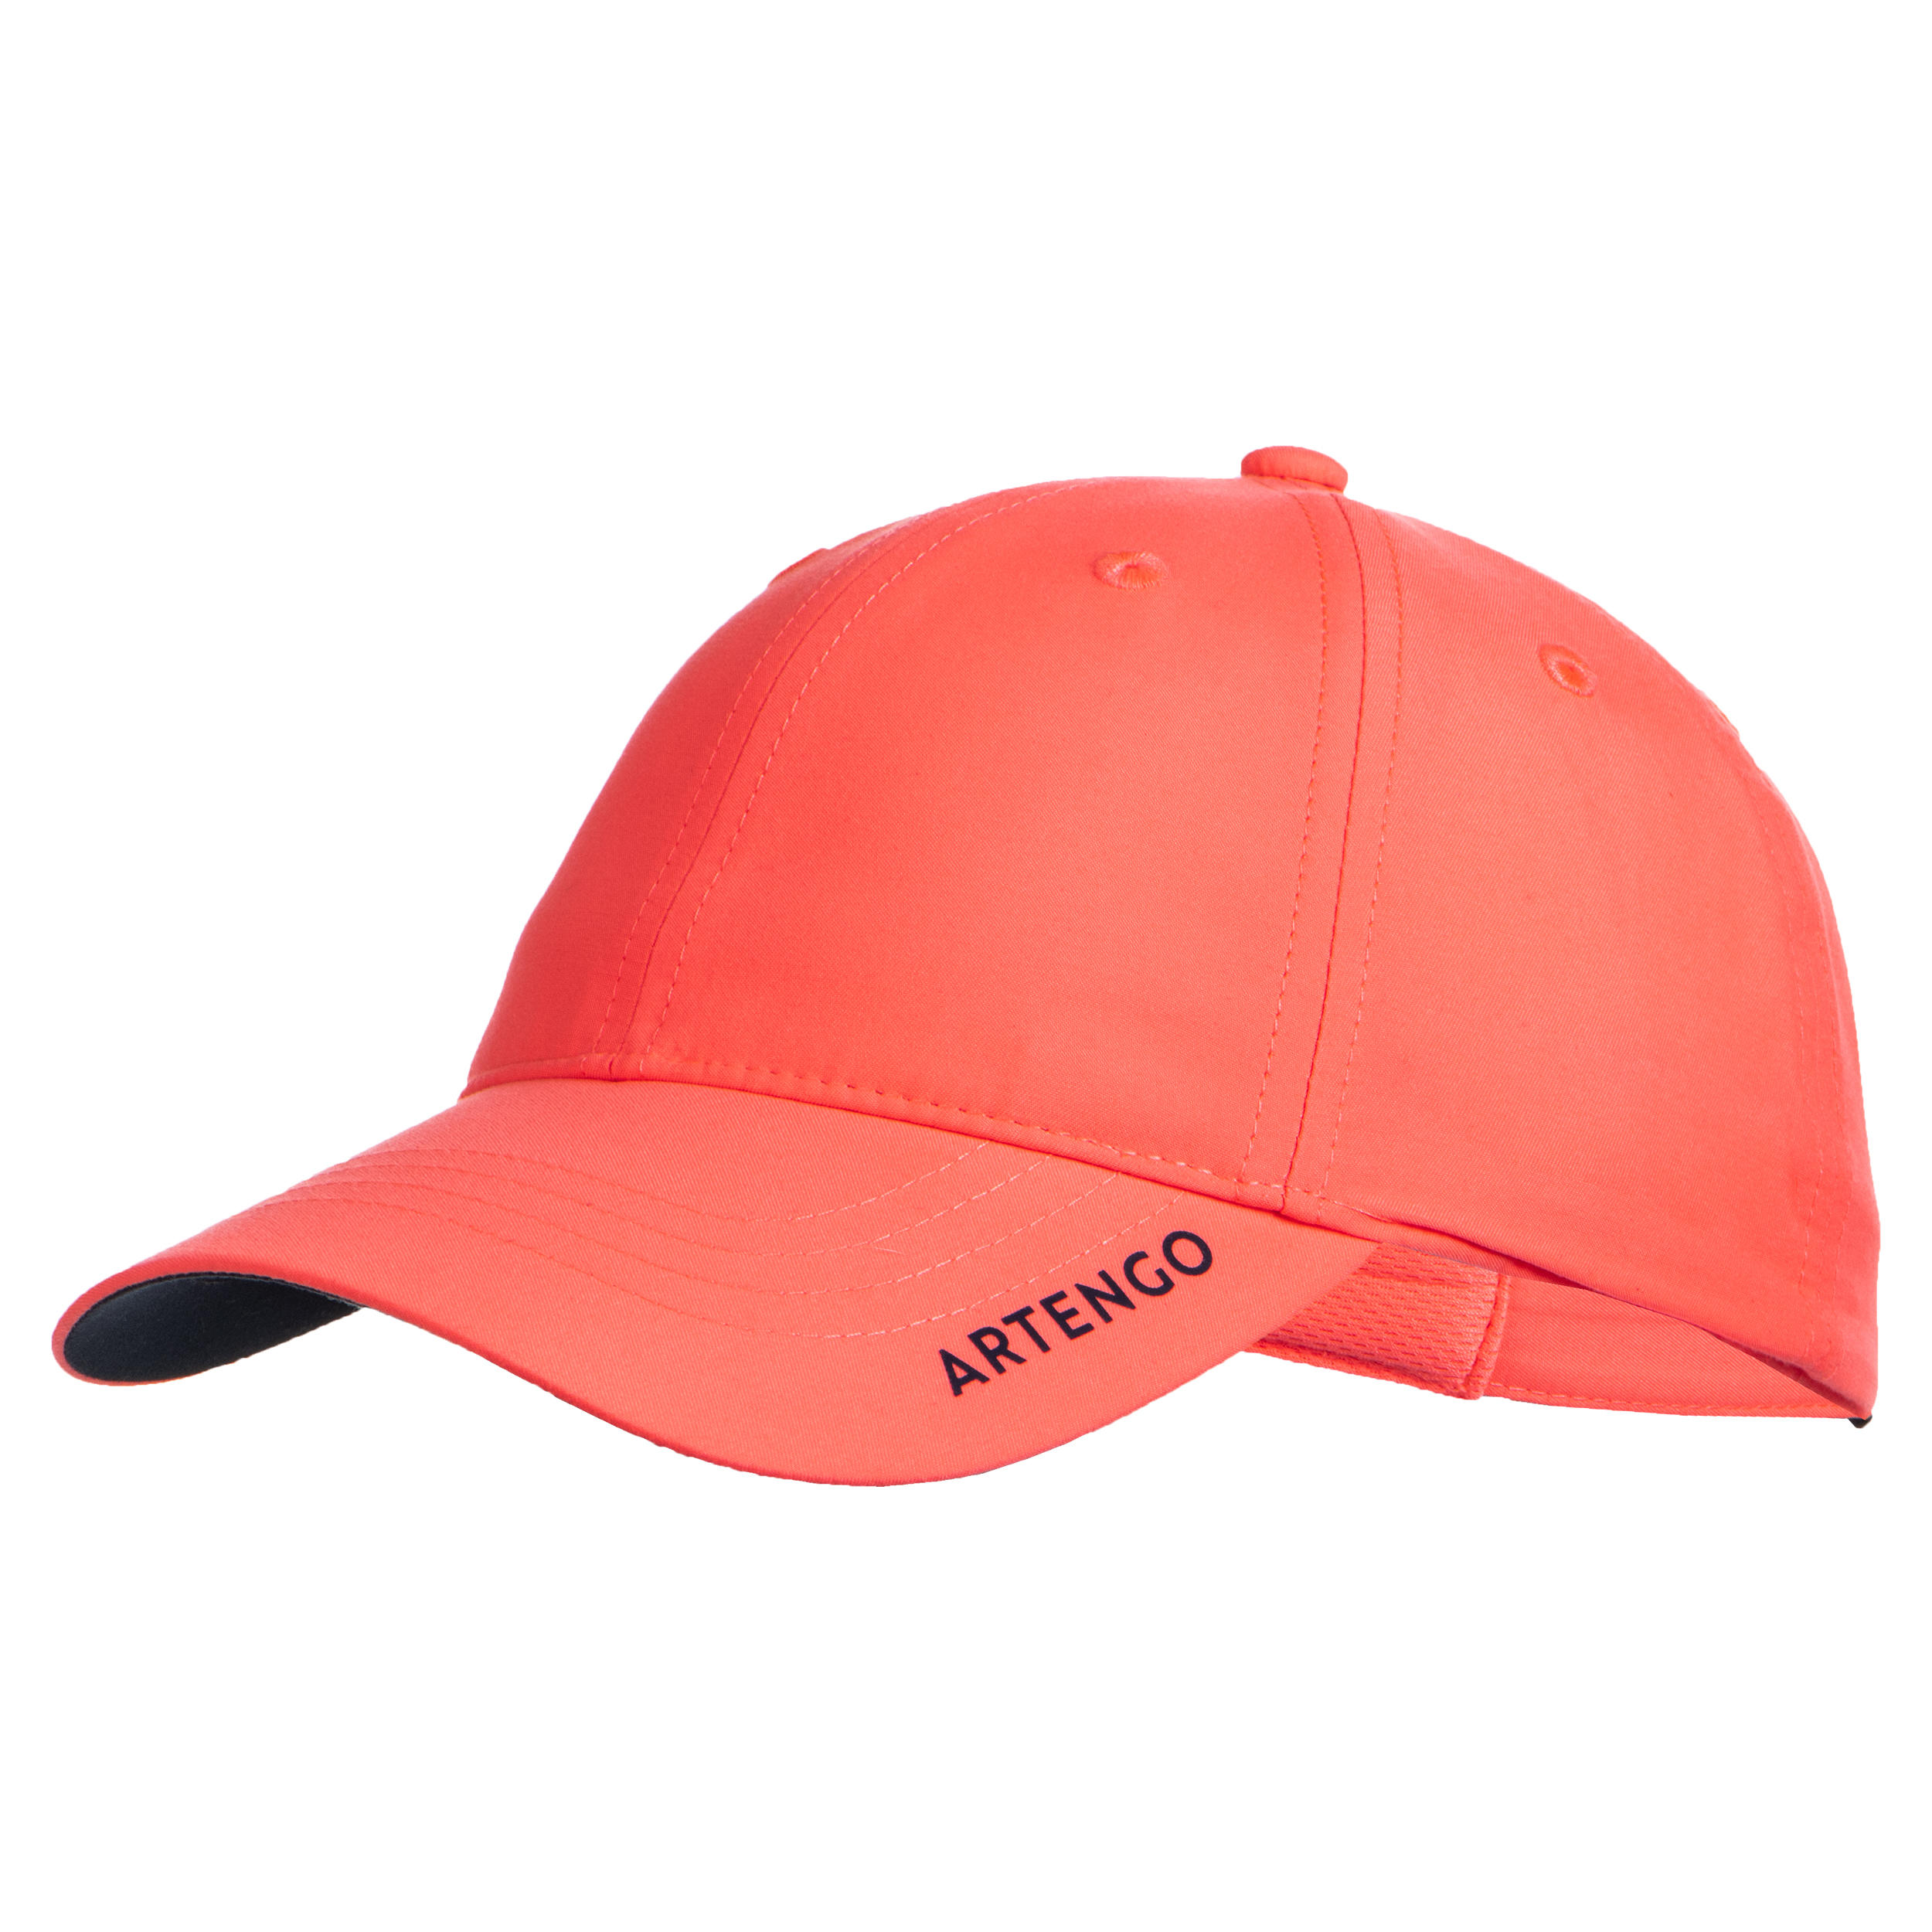 Schirmmütze Tennis-Cap TC 500 Gr.54 rosa/marineblau